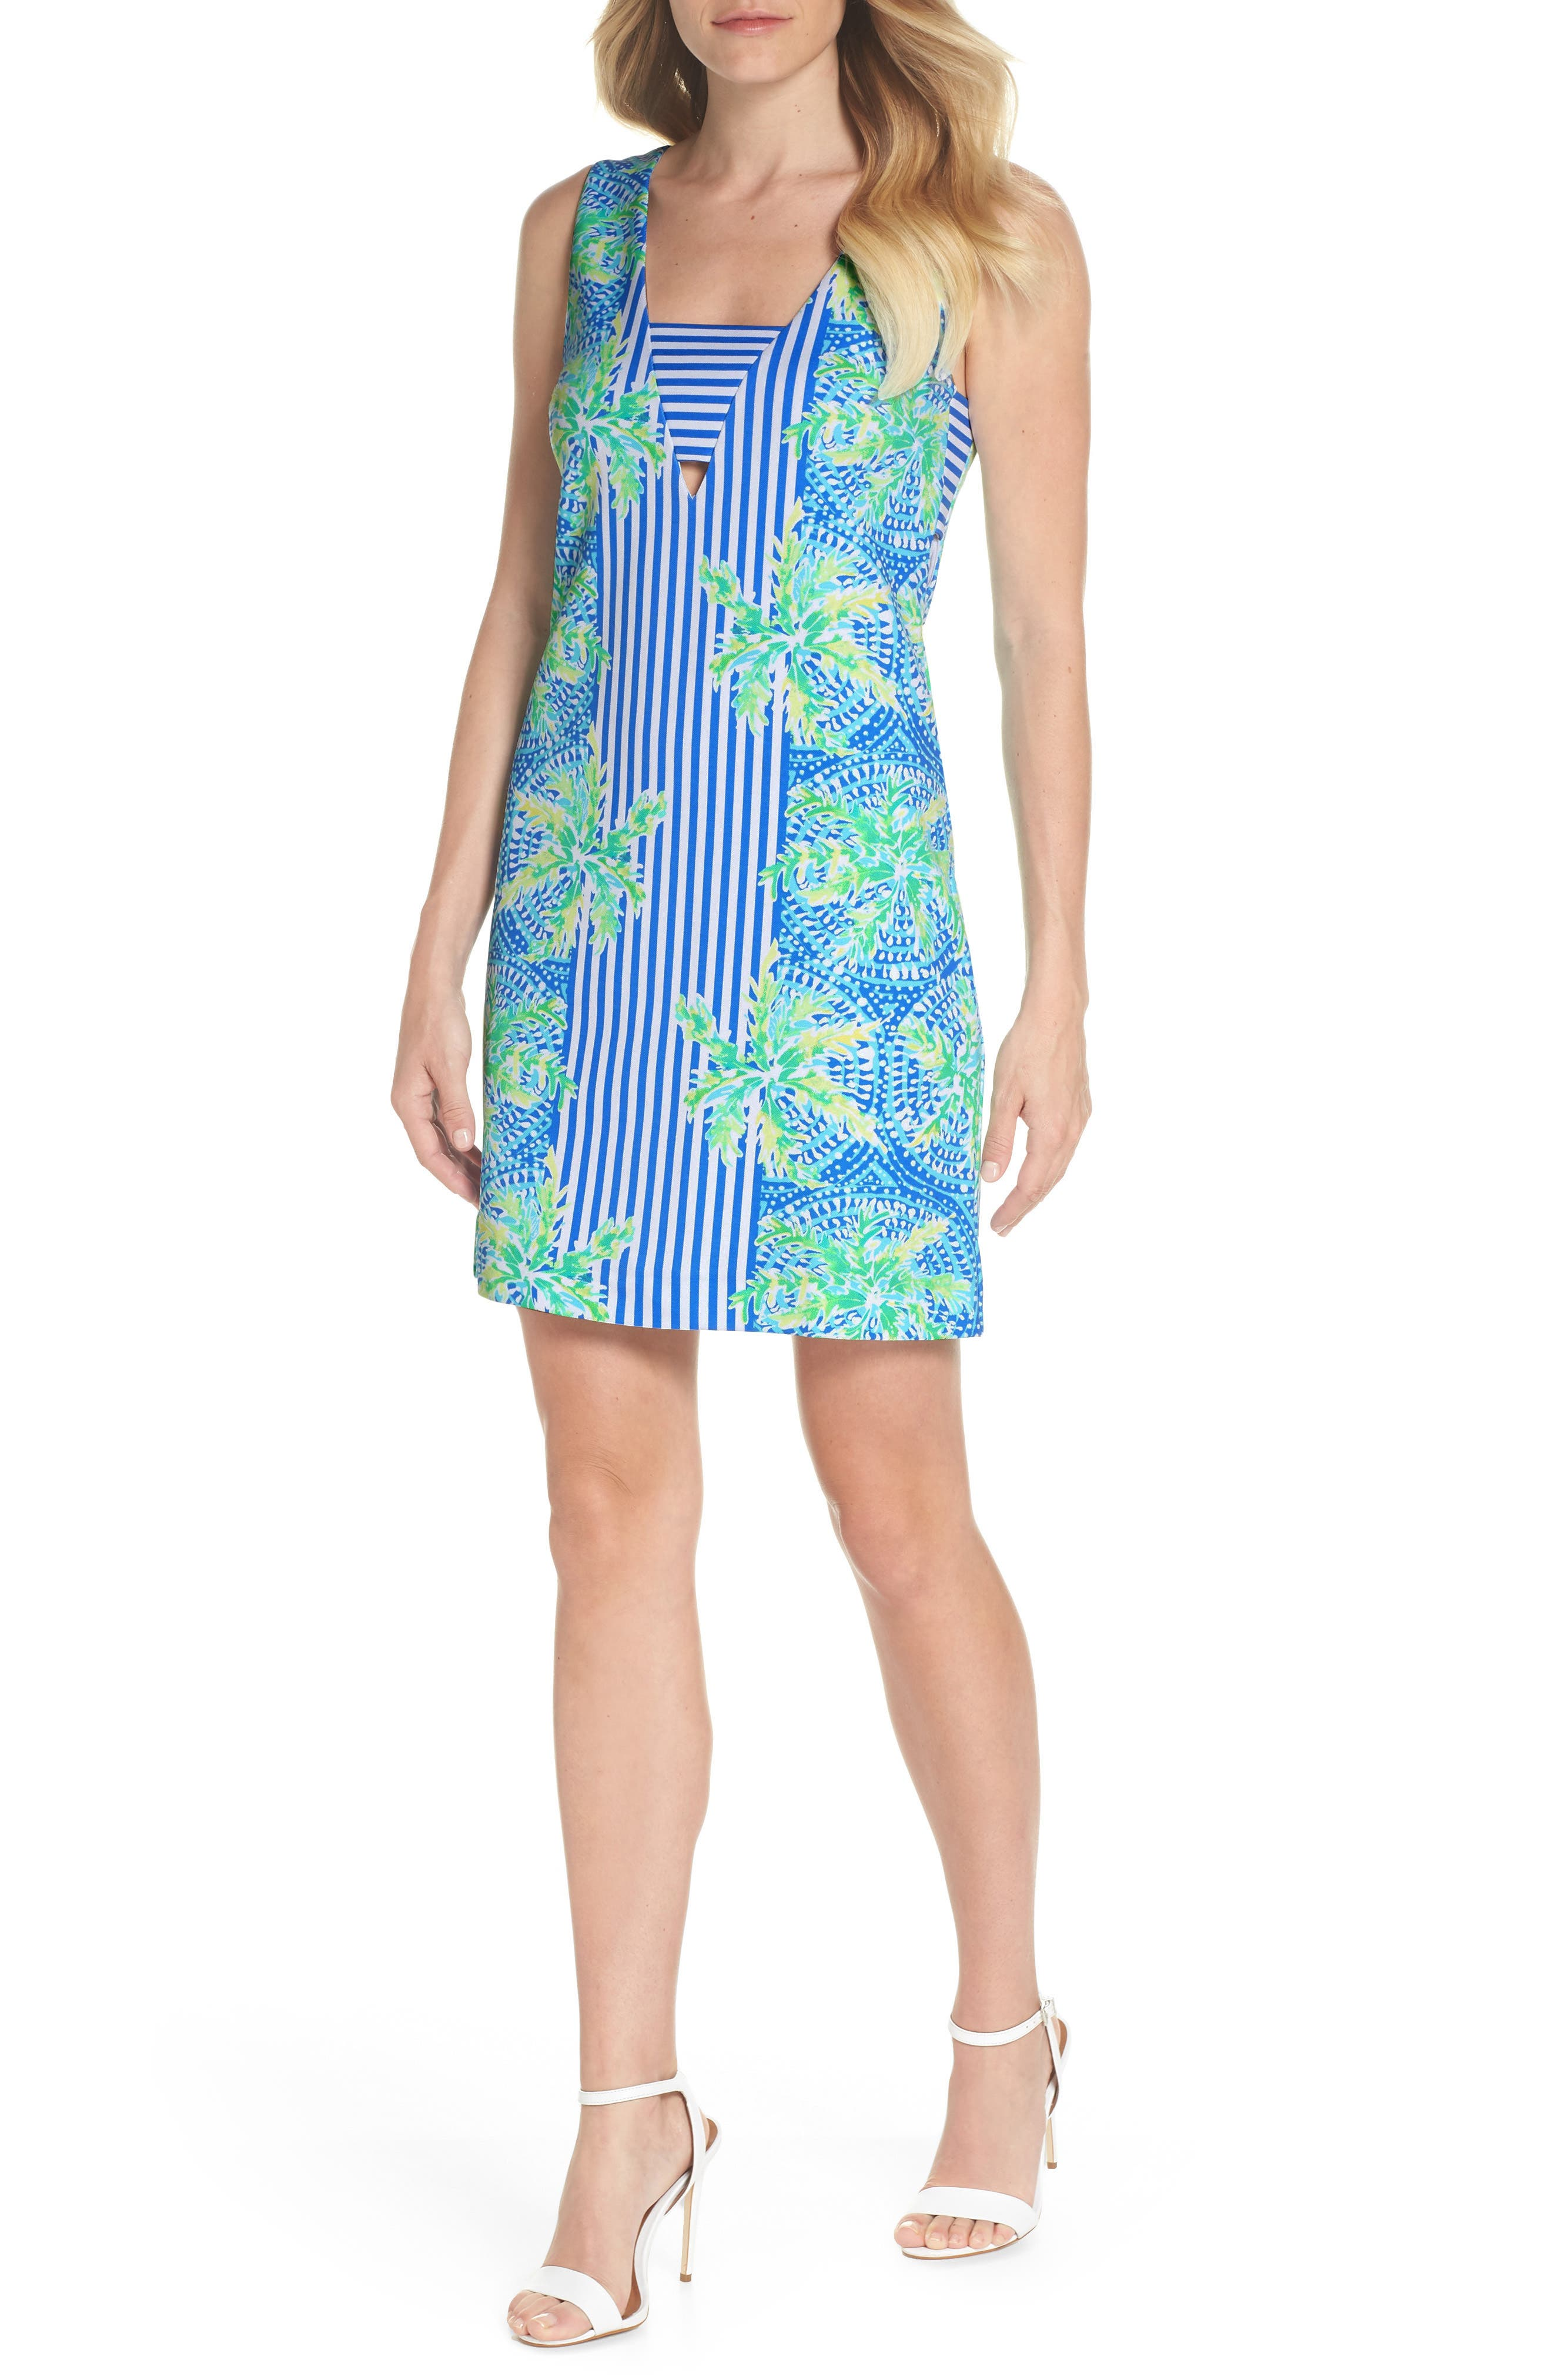 Chiara Stripe & Floral Print Dress,                         Main,                         color, BENNET BLUE TROPIC LIKE ITS